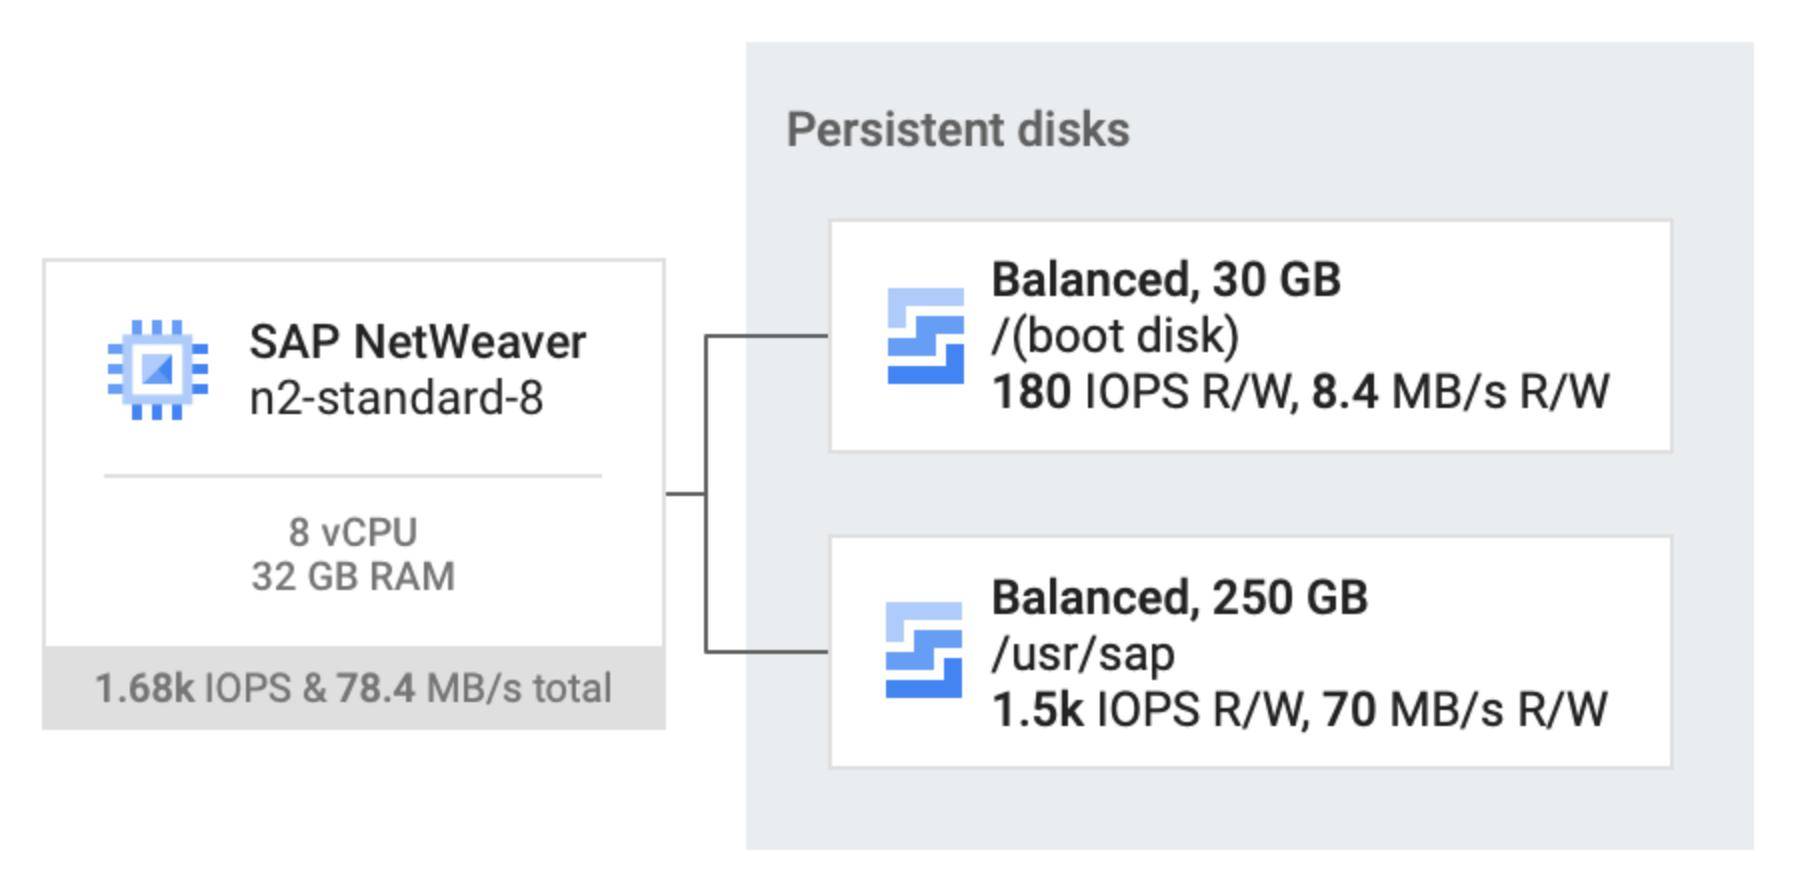 SAP NetWeaver를 실행하는 n2-standard-32 호스트 VM에 균형 있는 영구 디스크 두 개(하나는 80GB, 다른 하나는 250GB)가 연결됩니다.